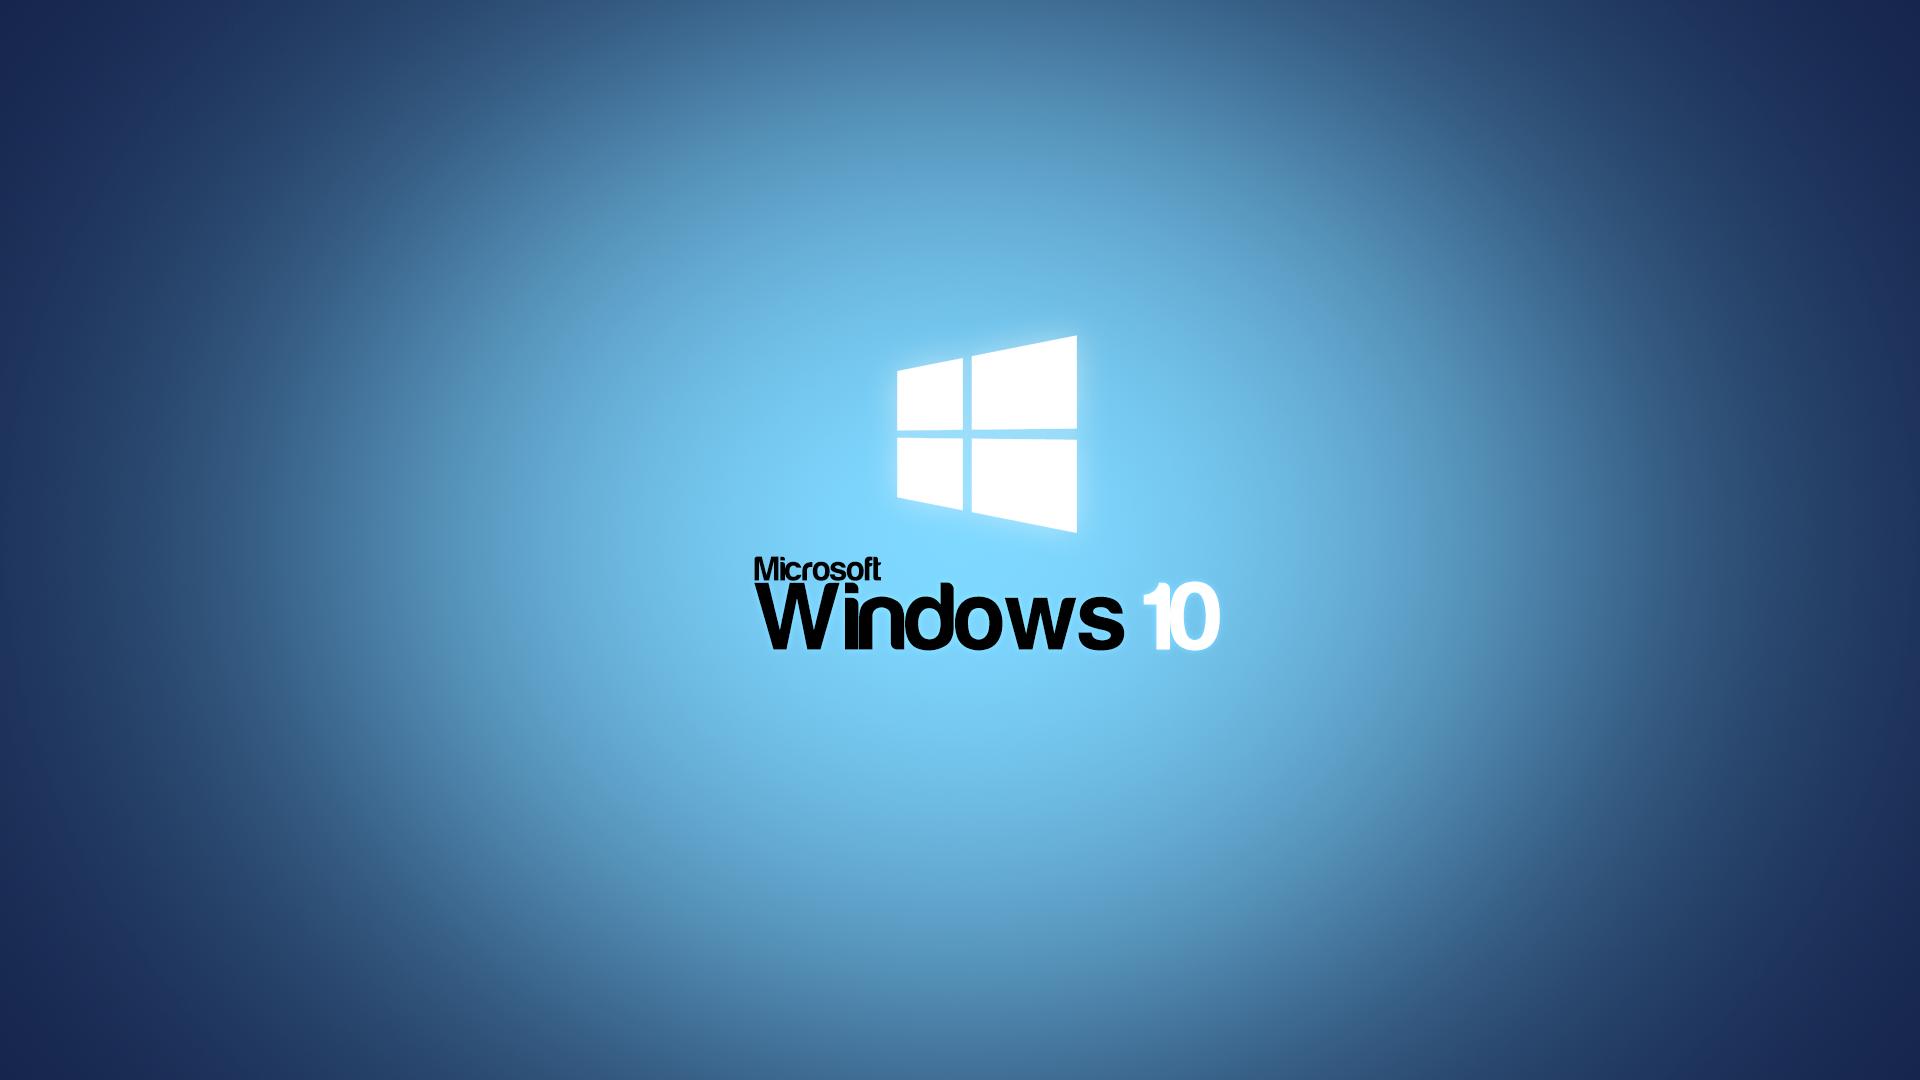 Win10 wallpaper by karara160 on deviantart for Microsoft win 10